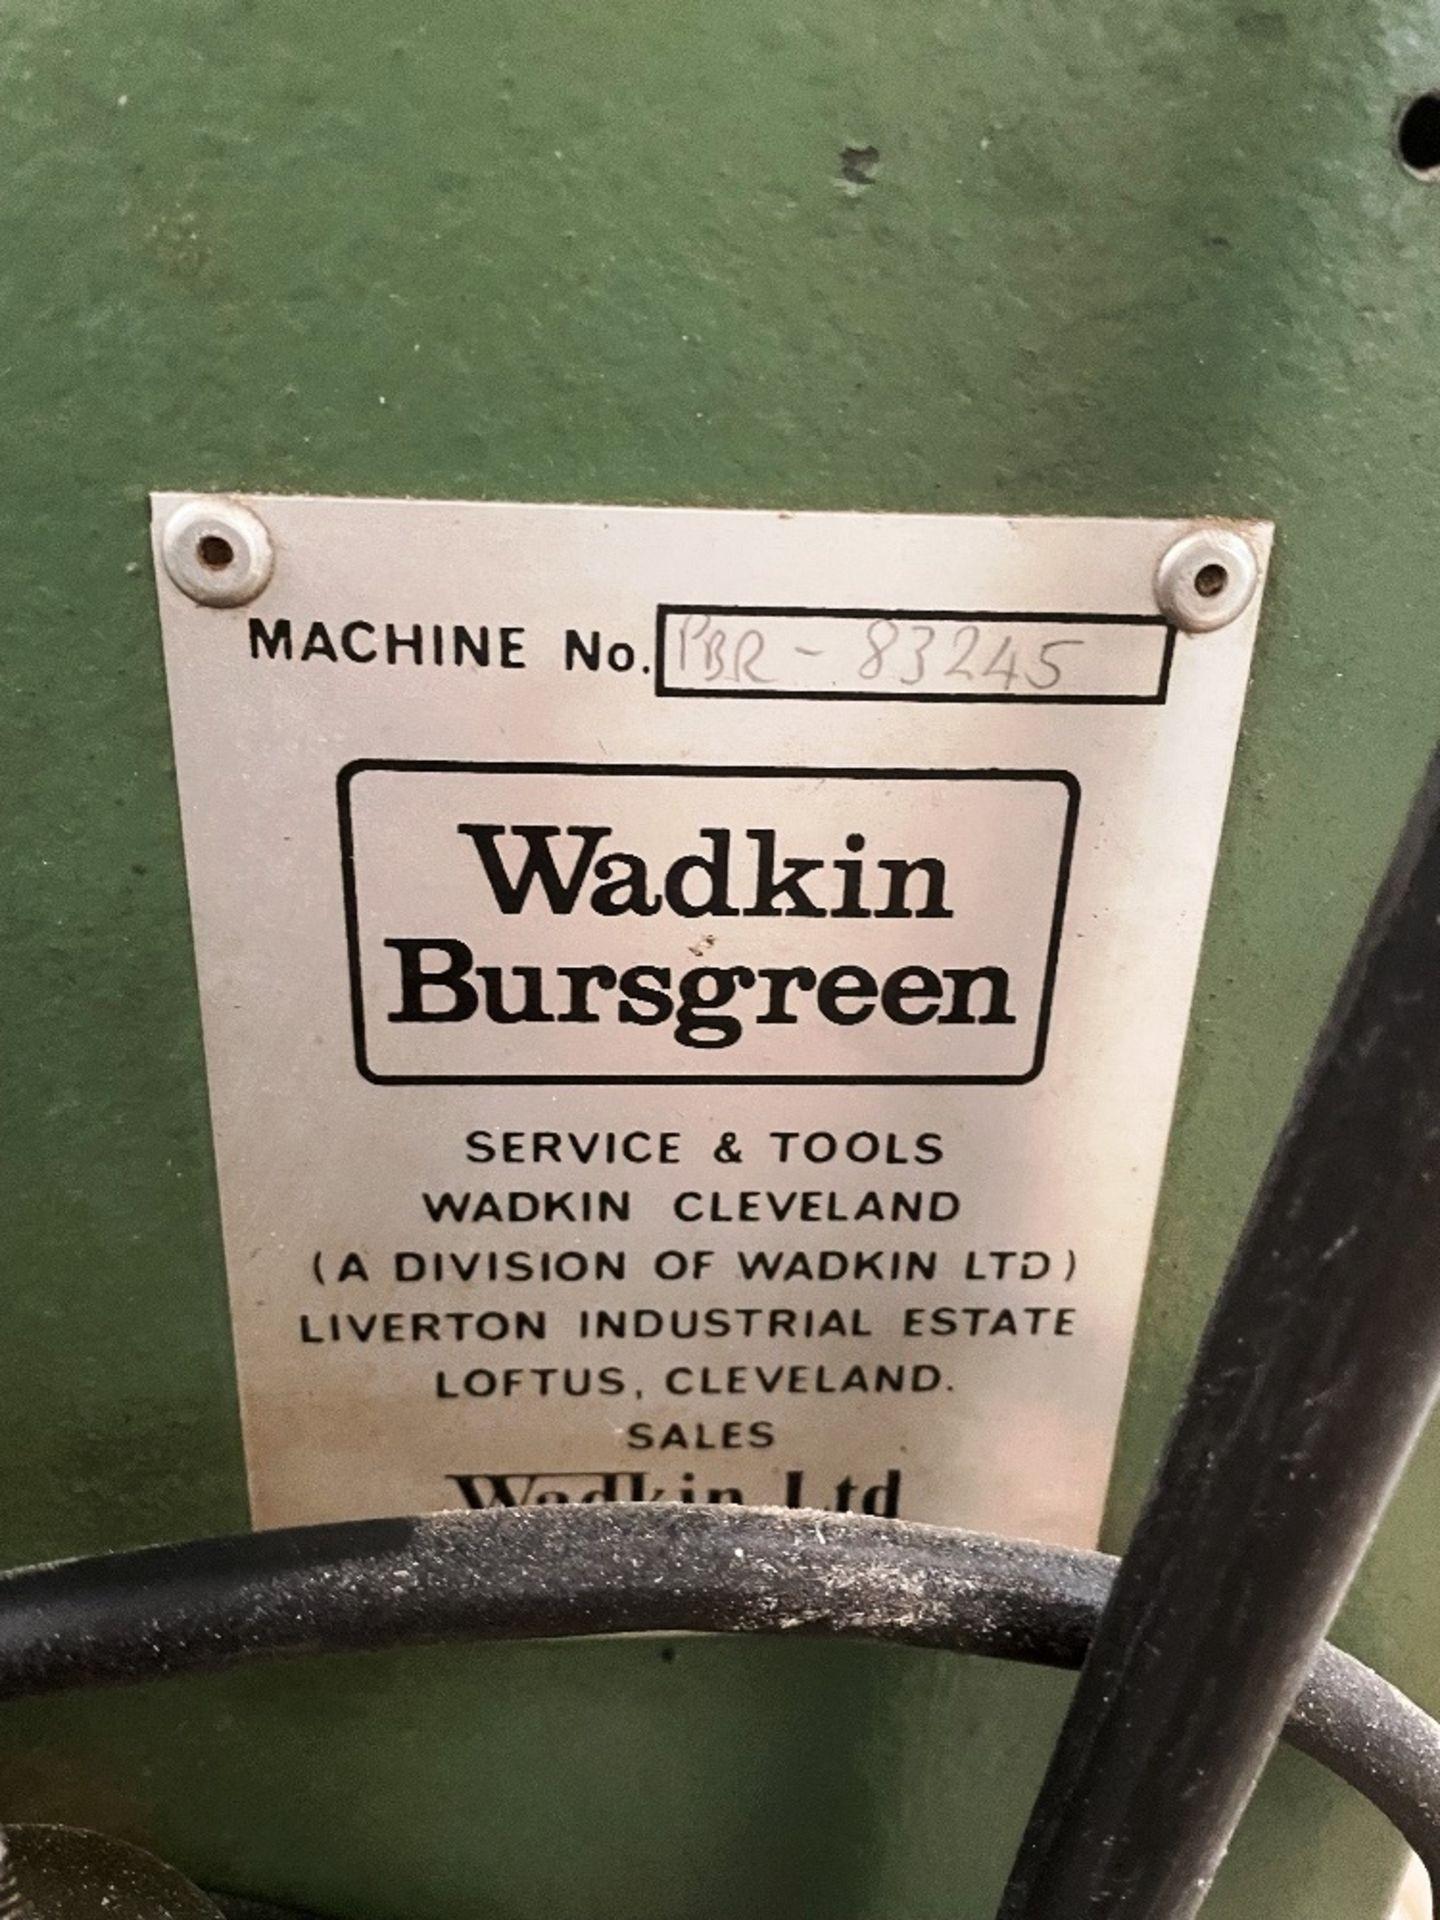 Wadkin Bursgreen Vertical Bandsaw w/ Power Feed - Image 5 of 9